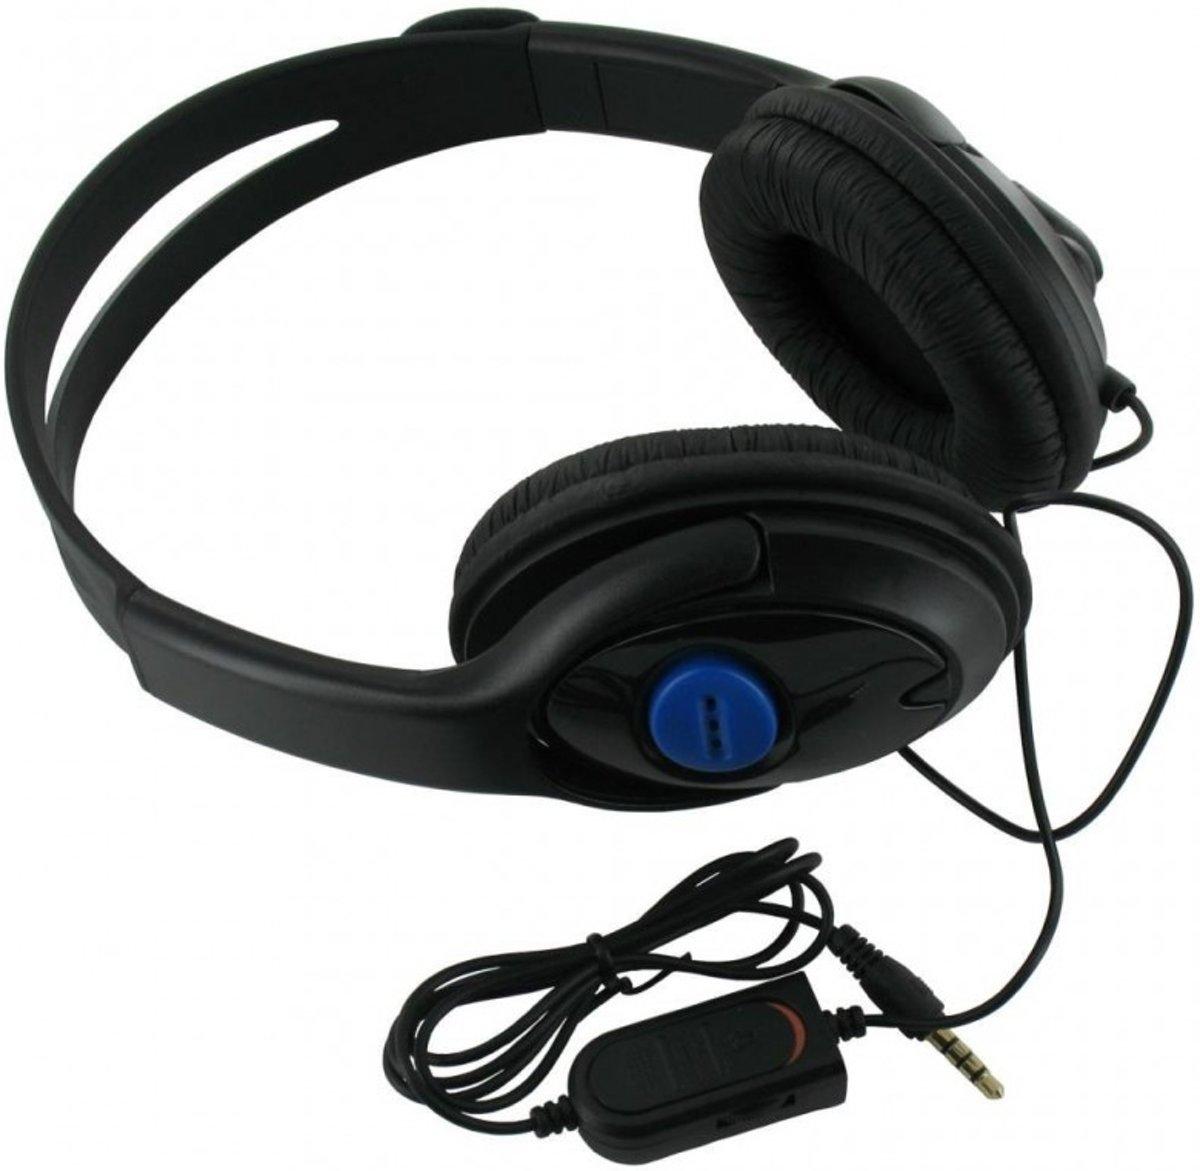 Gaming Headset met Draad voor Sony PlayStation 4 PS4 & Online